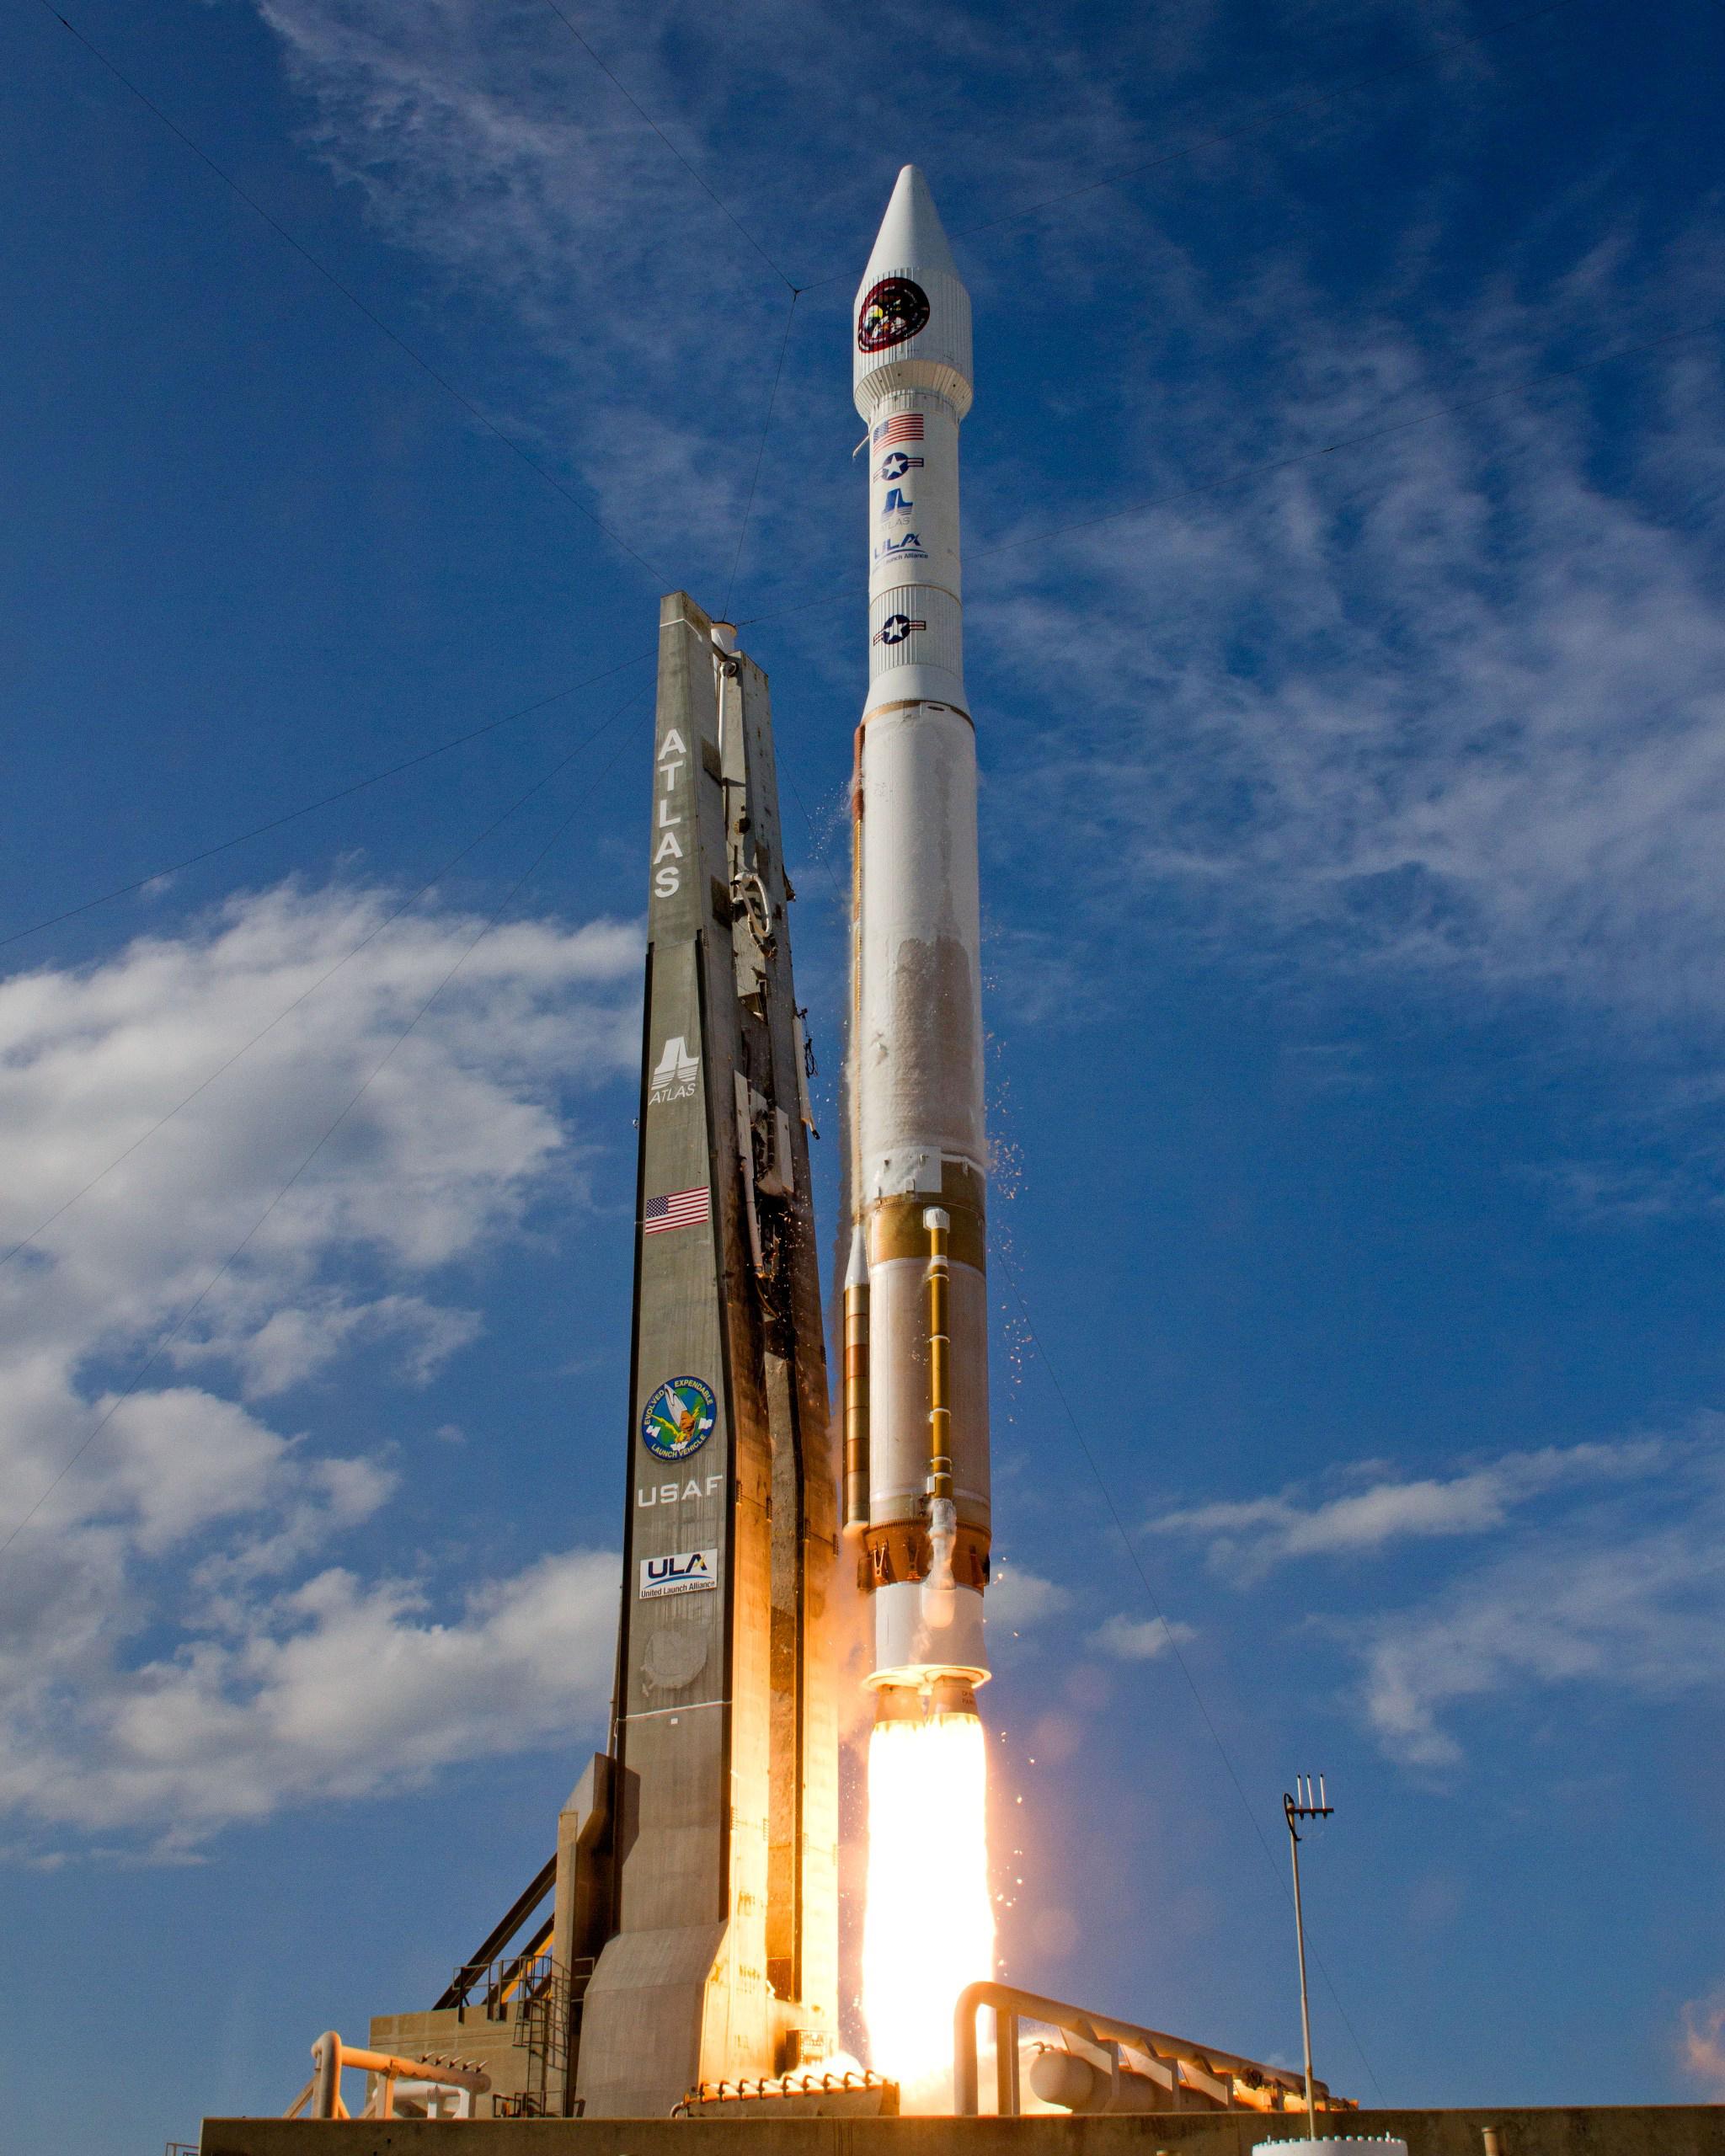 ULA Atlas 5 Rocket Launches SBIRS GEO-2 Satellite